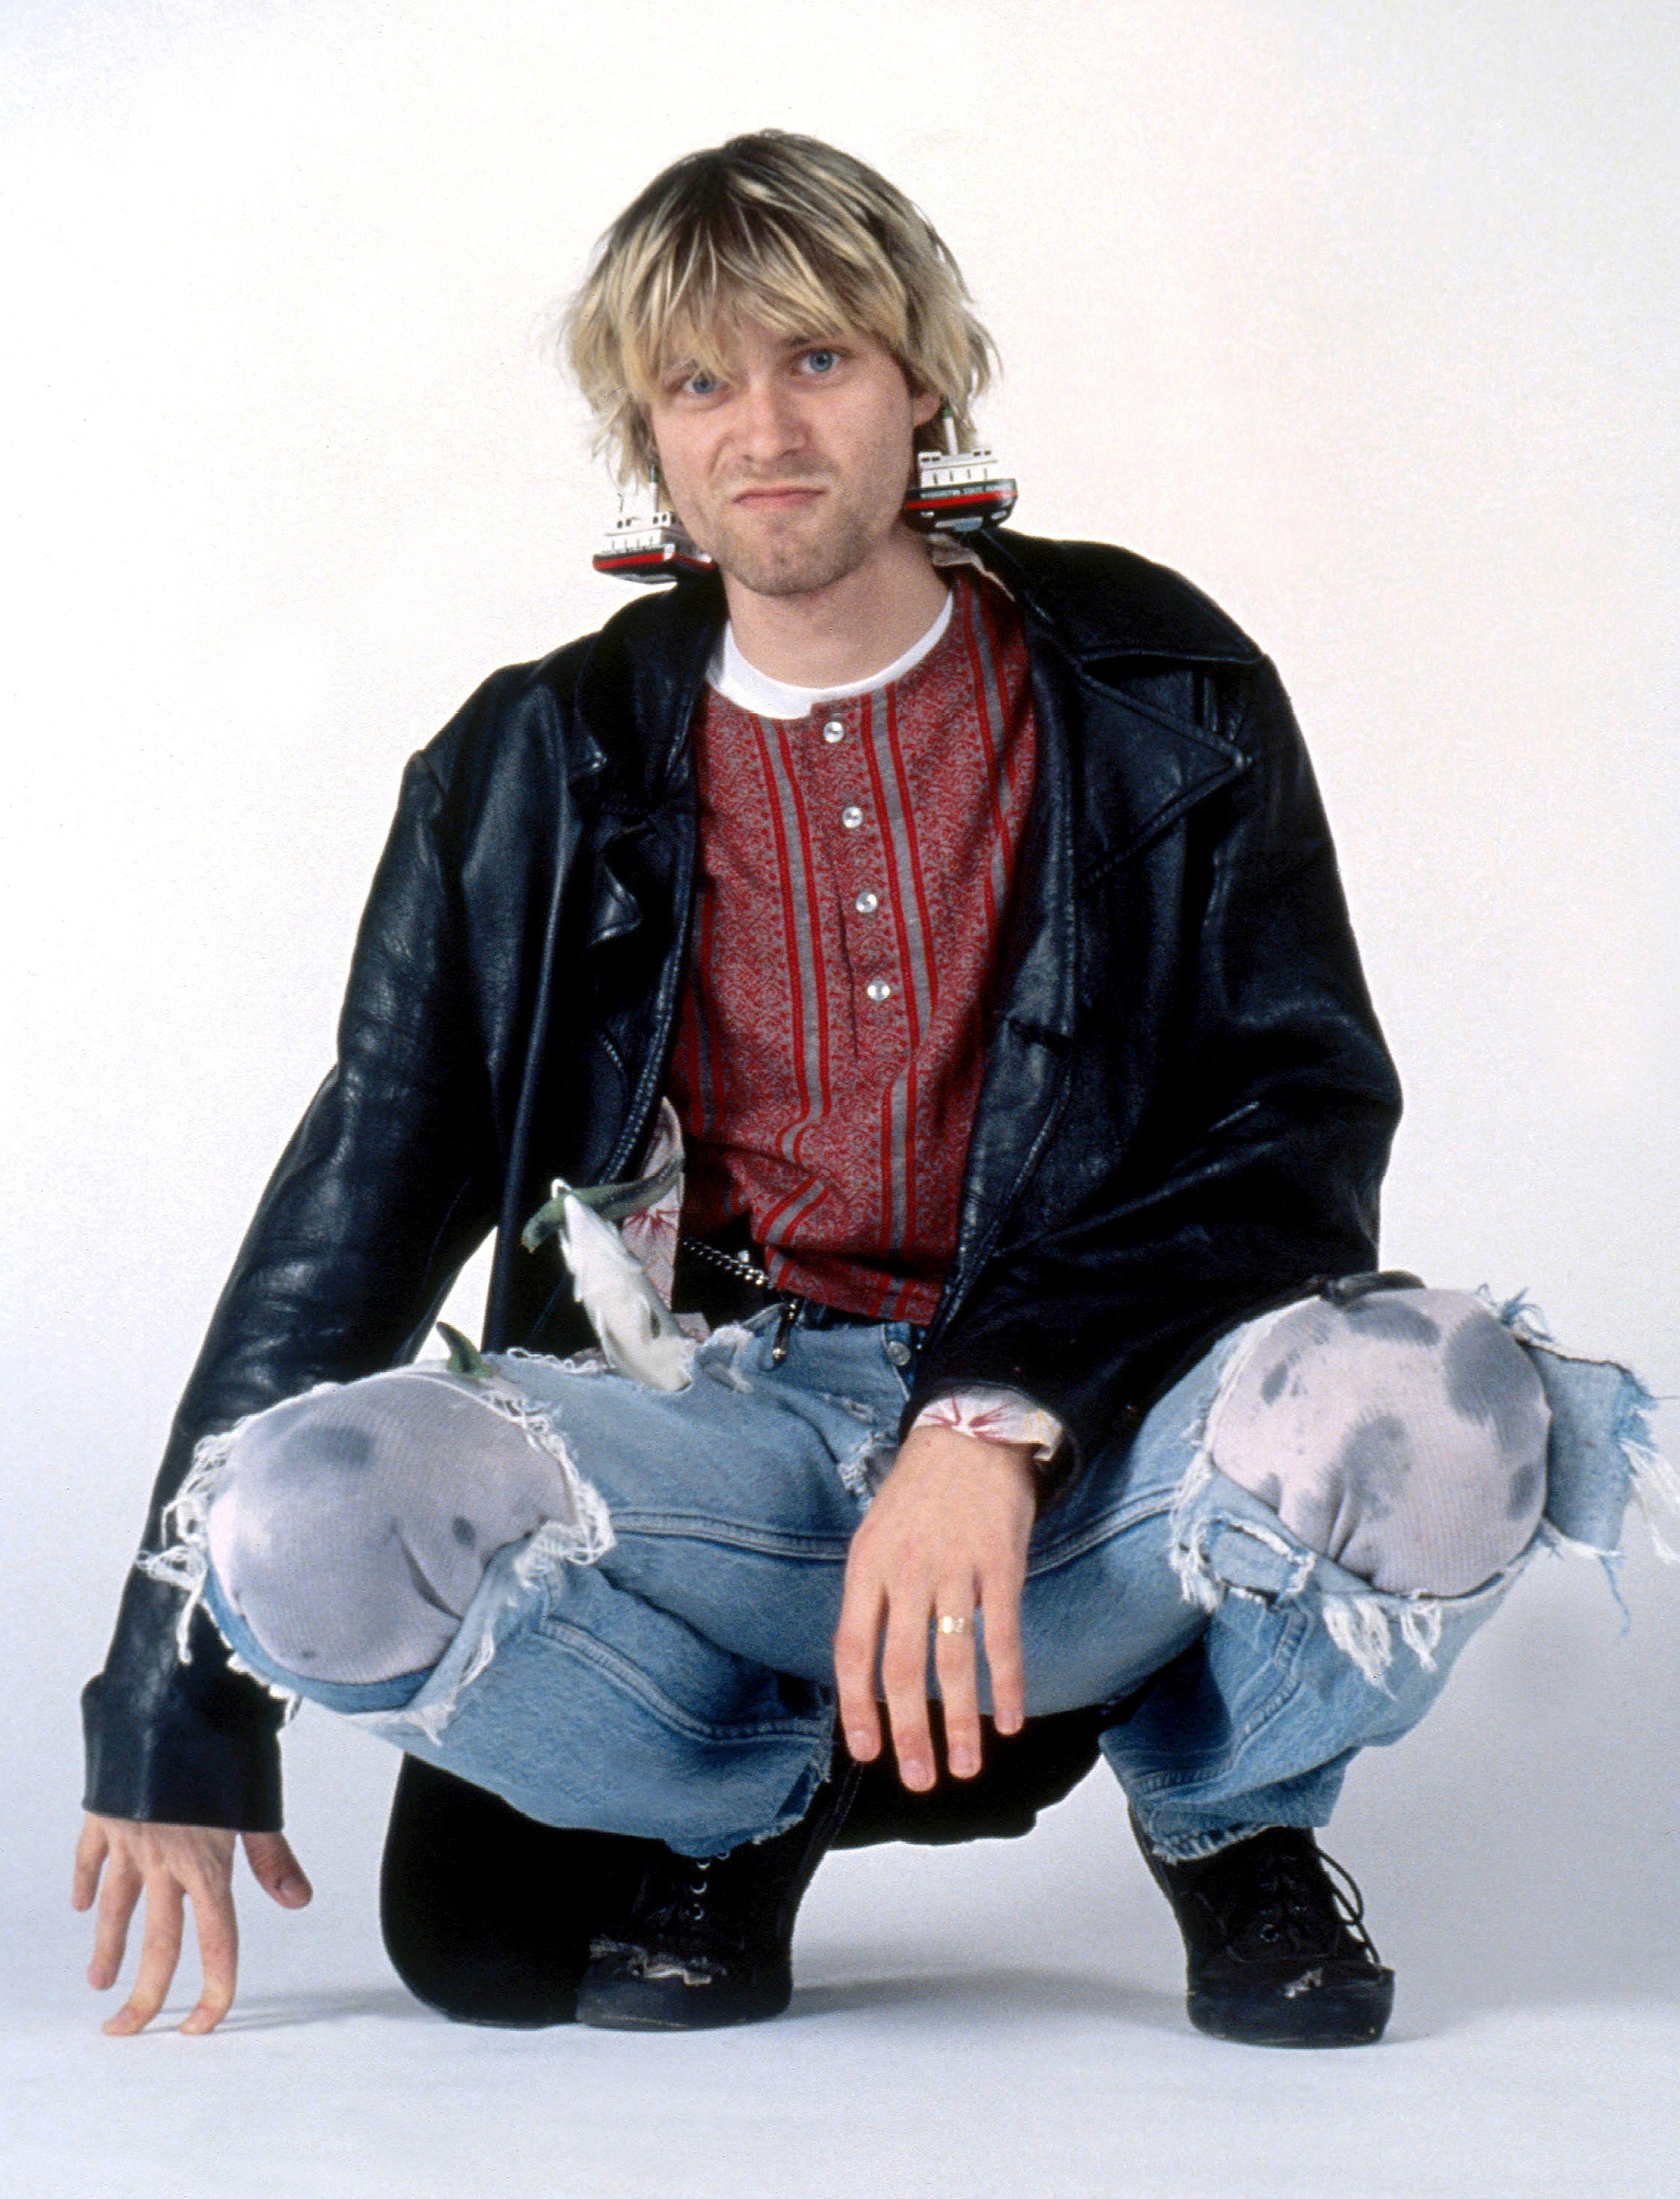 Kurt Cobain November 1992 Seattle Wa Kurt Cobain Style Kurt Cobain Donald Cobain [ 3669 x 2803 Pixel ]